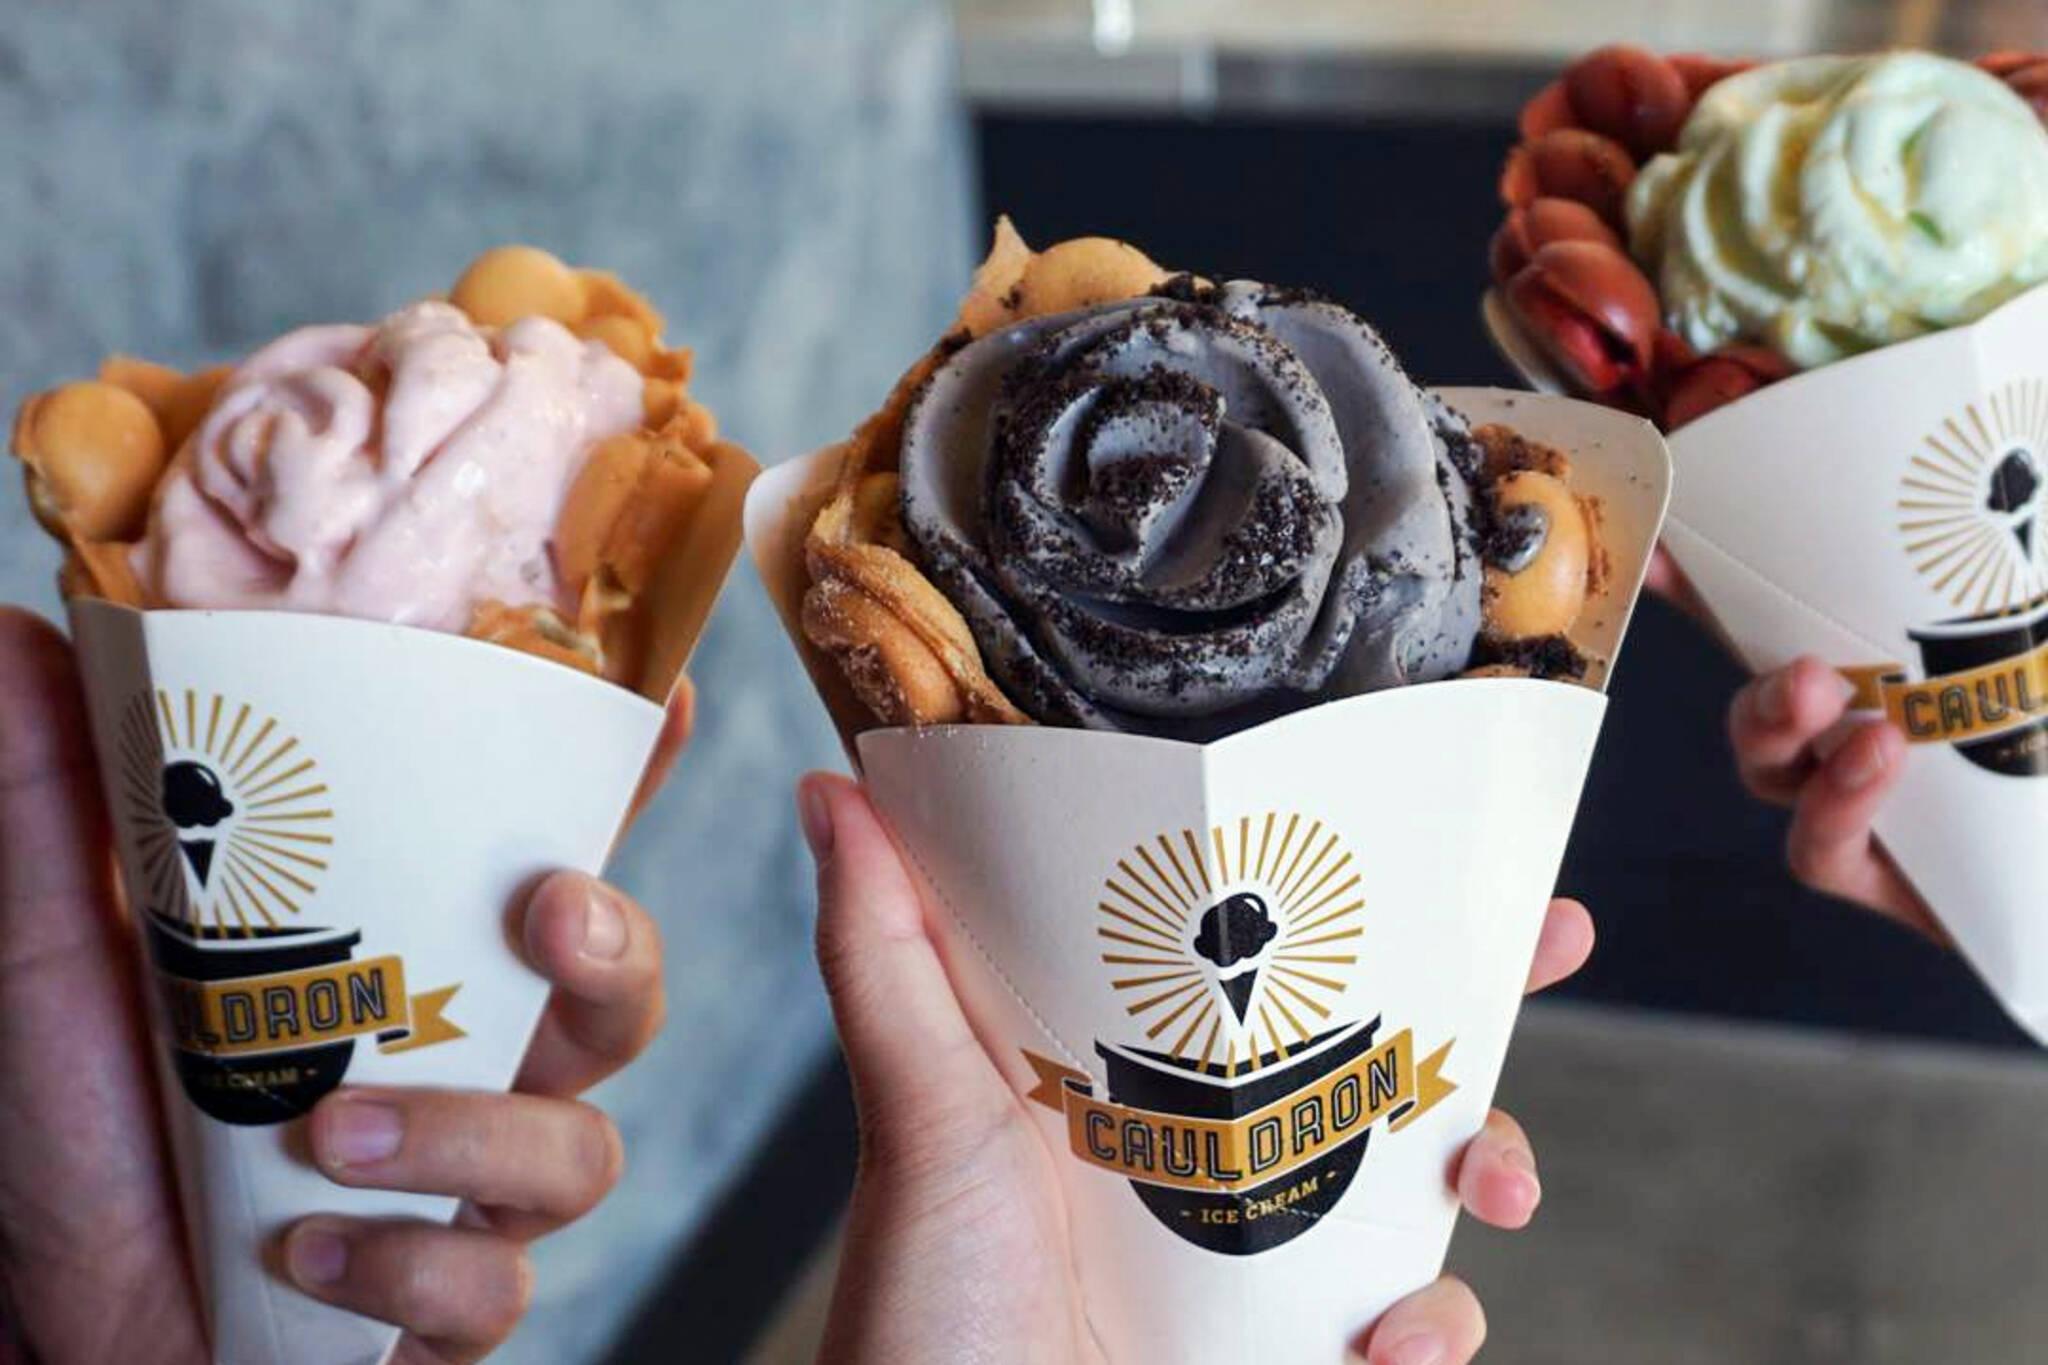 cauldron ice cream toronto